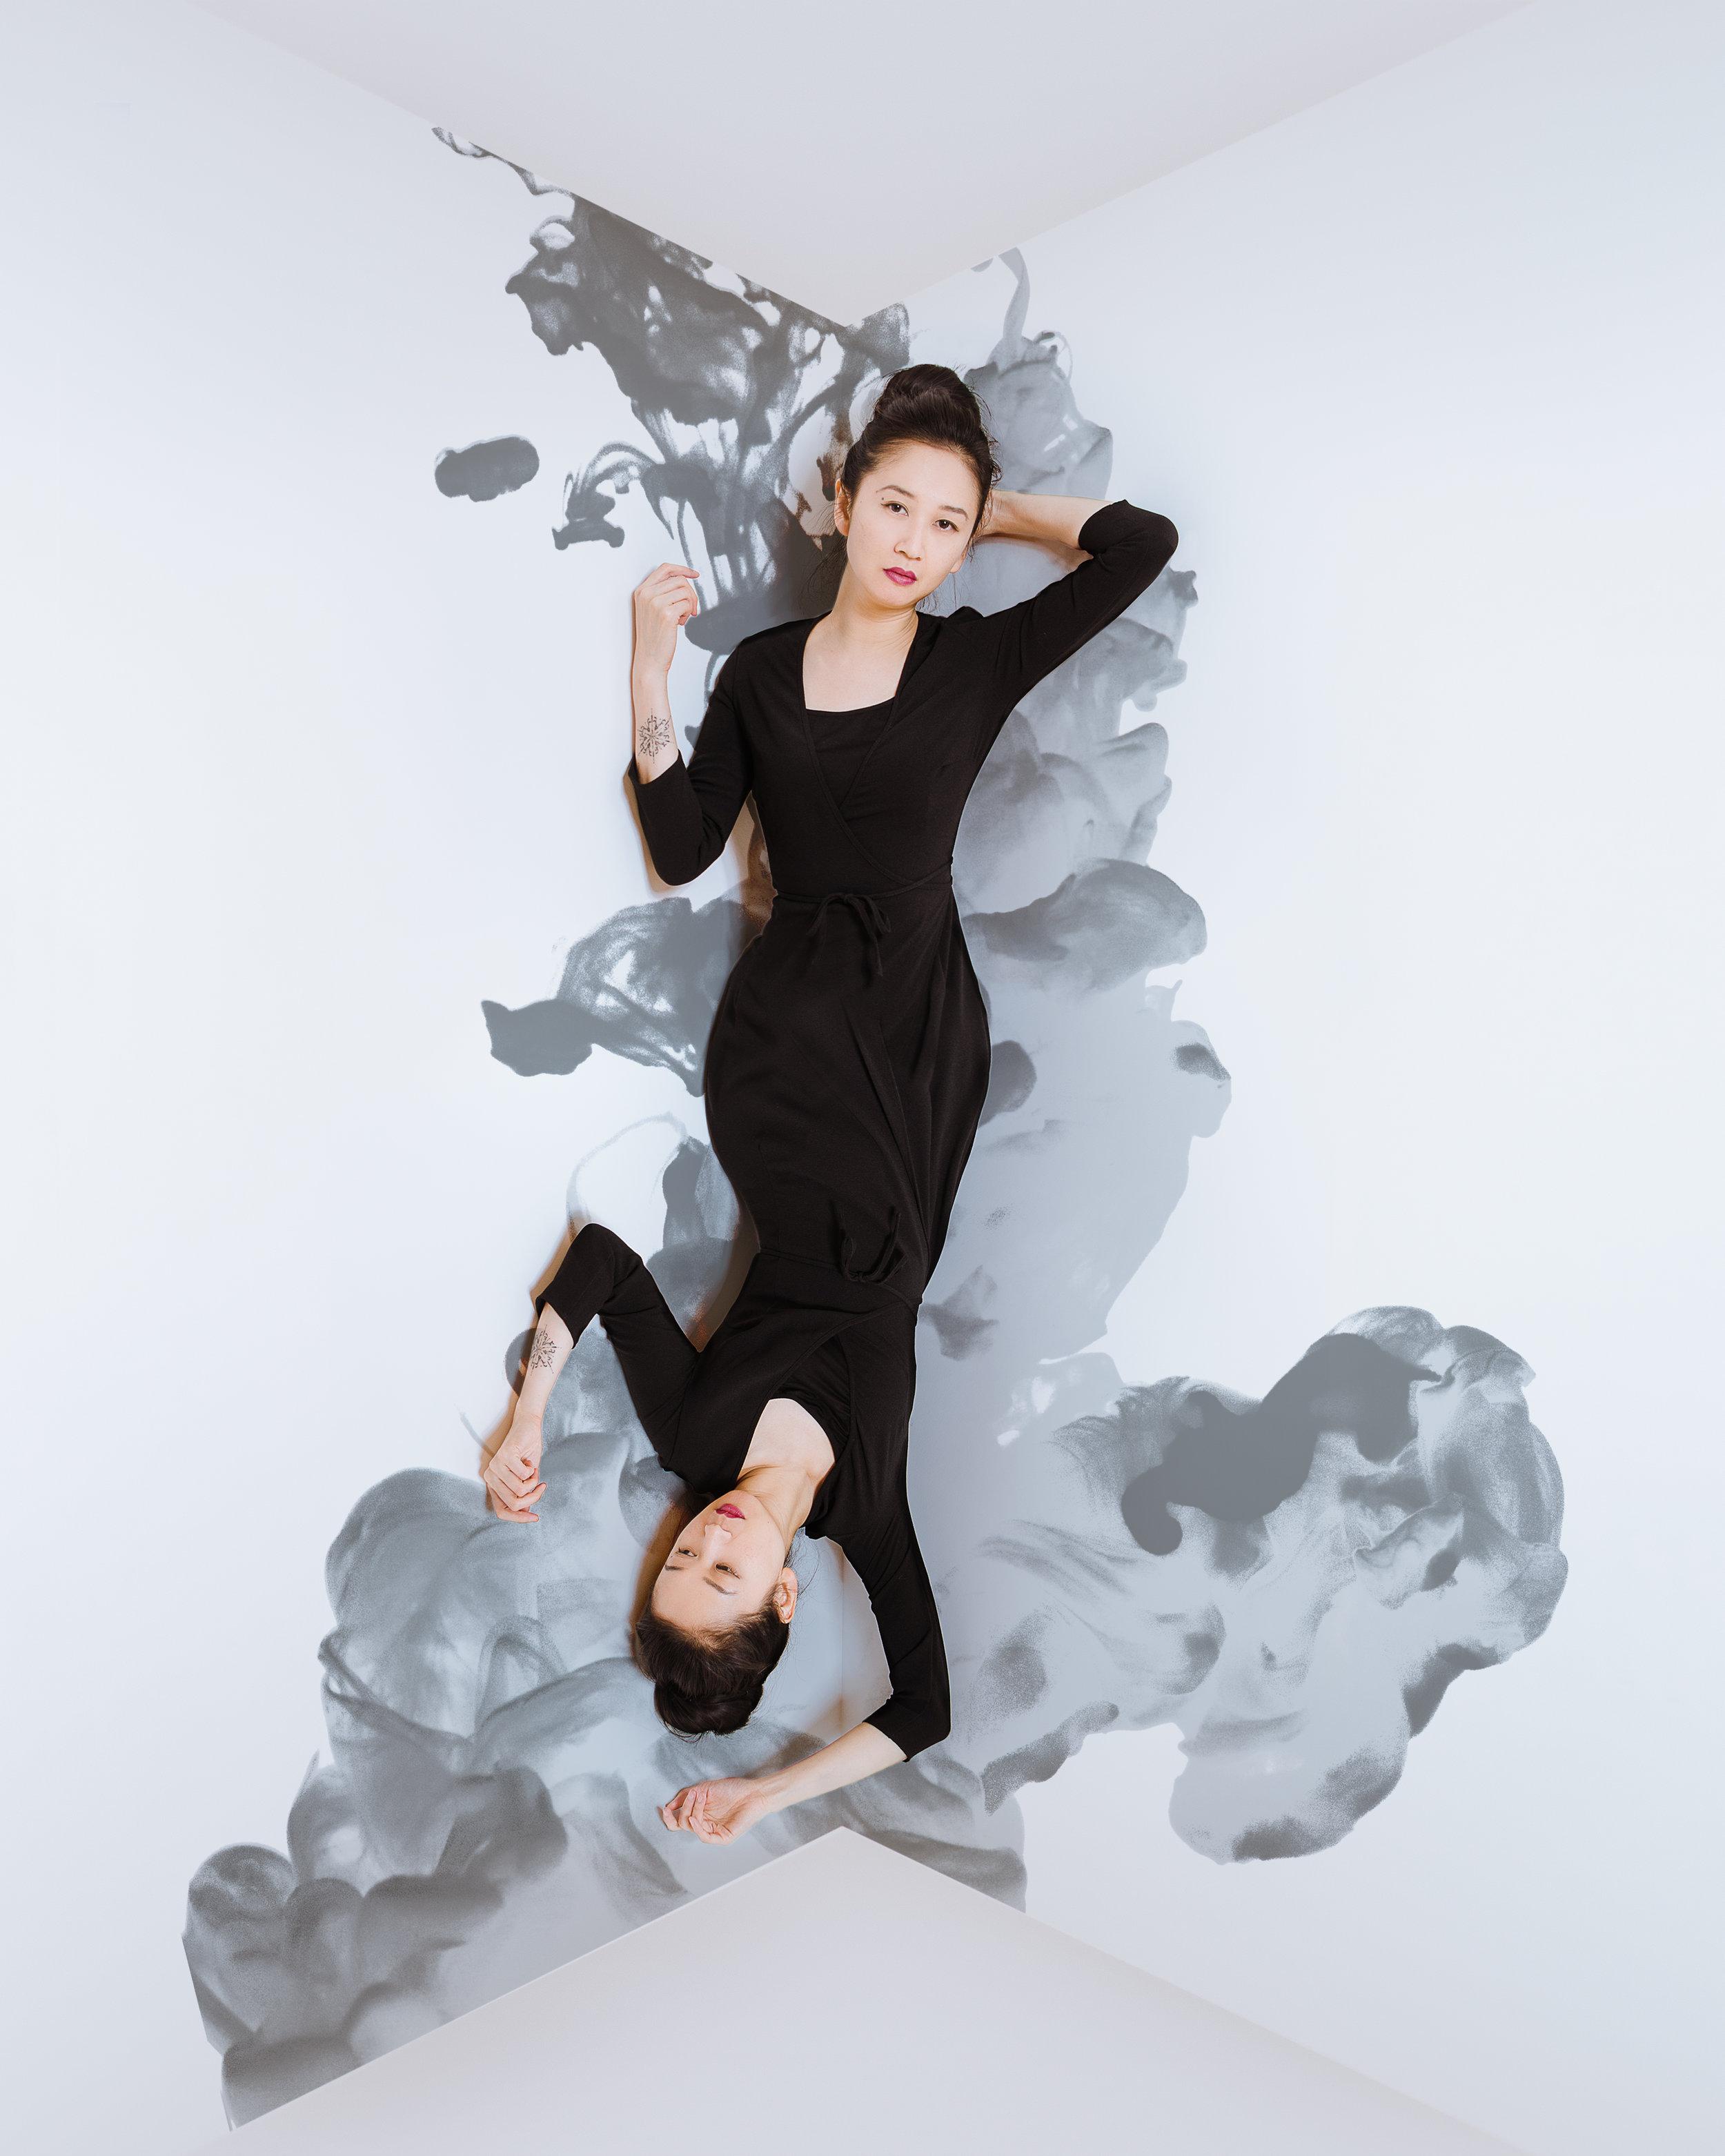 creative-portrait-twins-ink-flow-ckayee.jpg